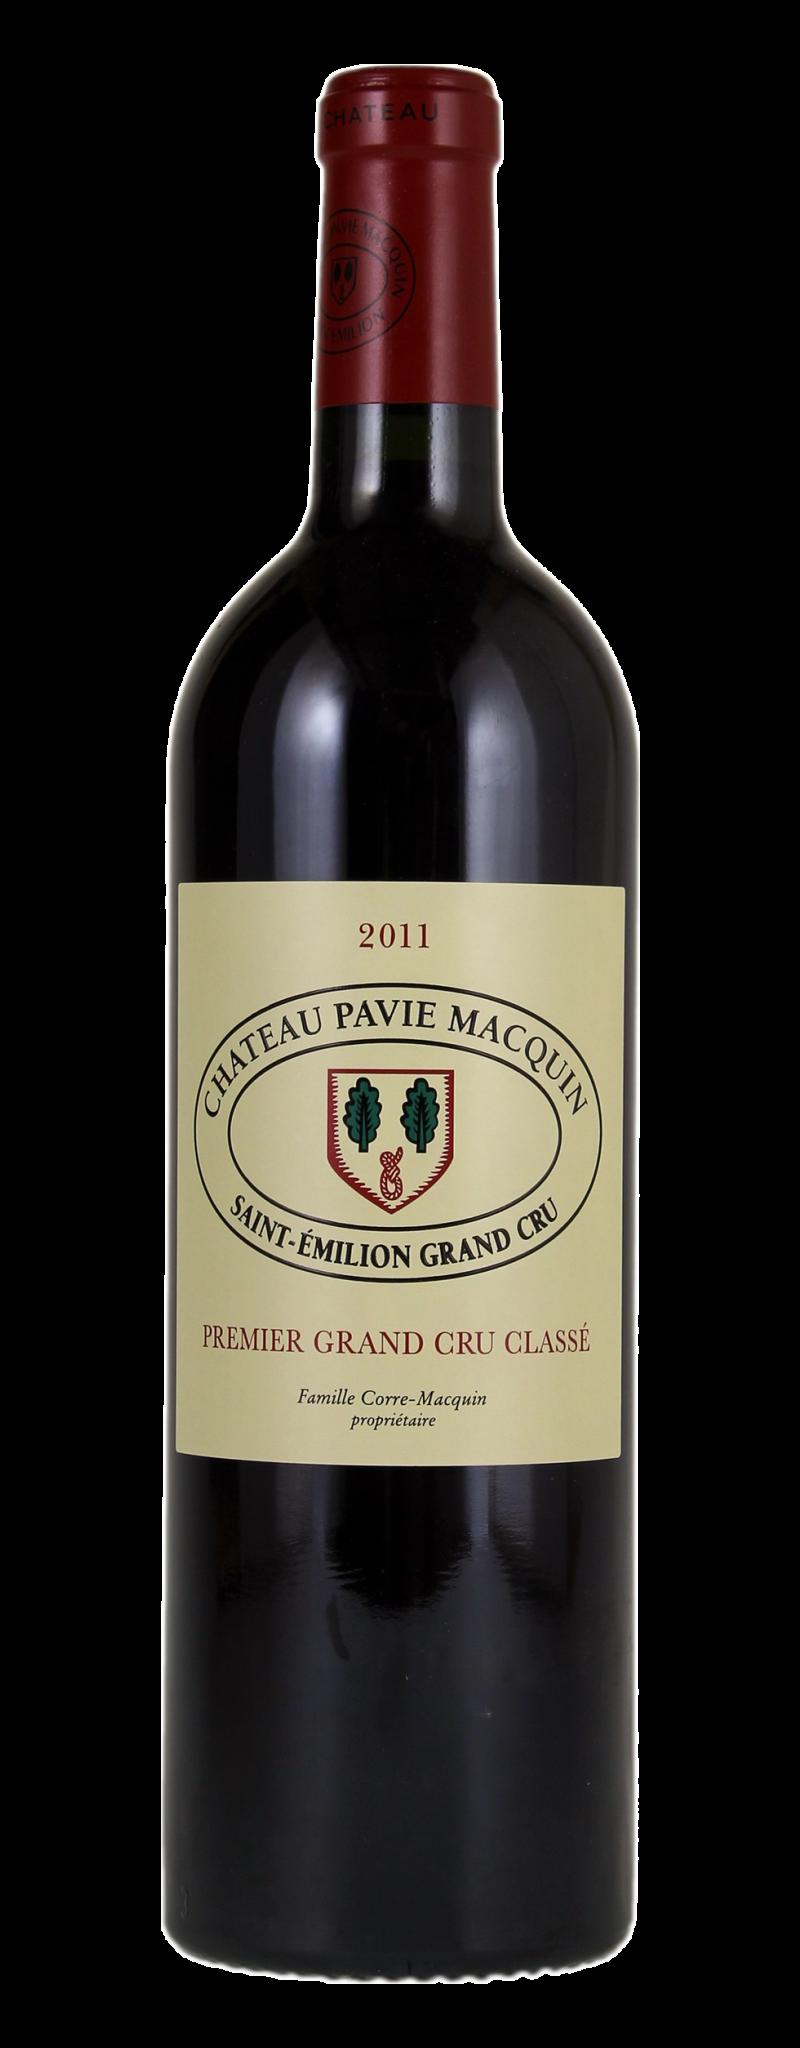 Chateau Pavie Macquin 2011  - 750ml